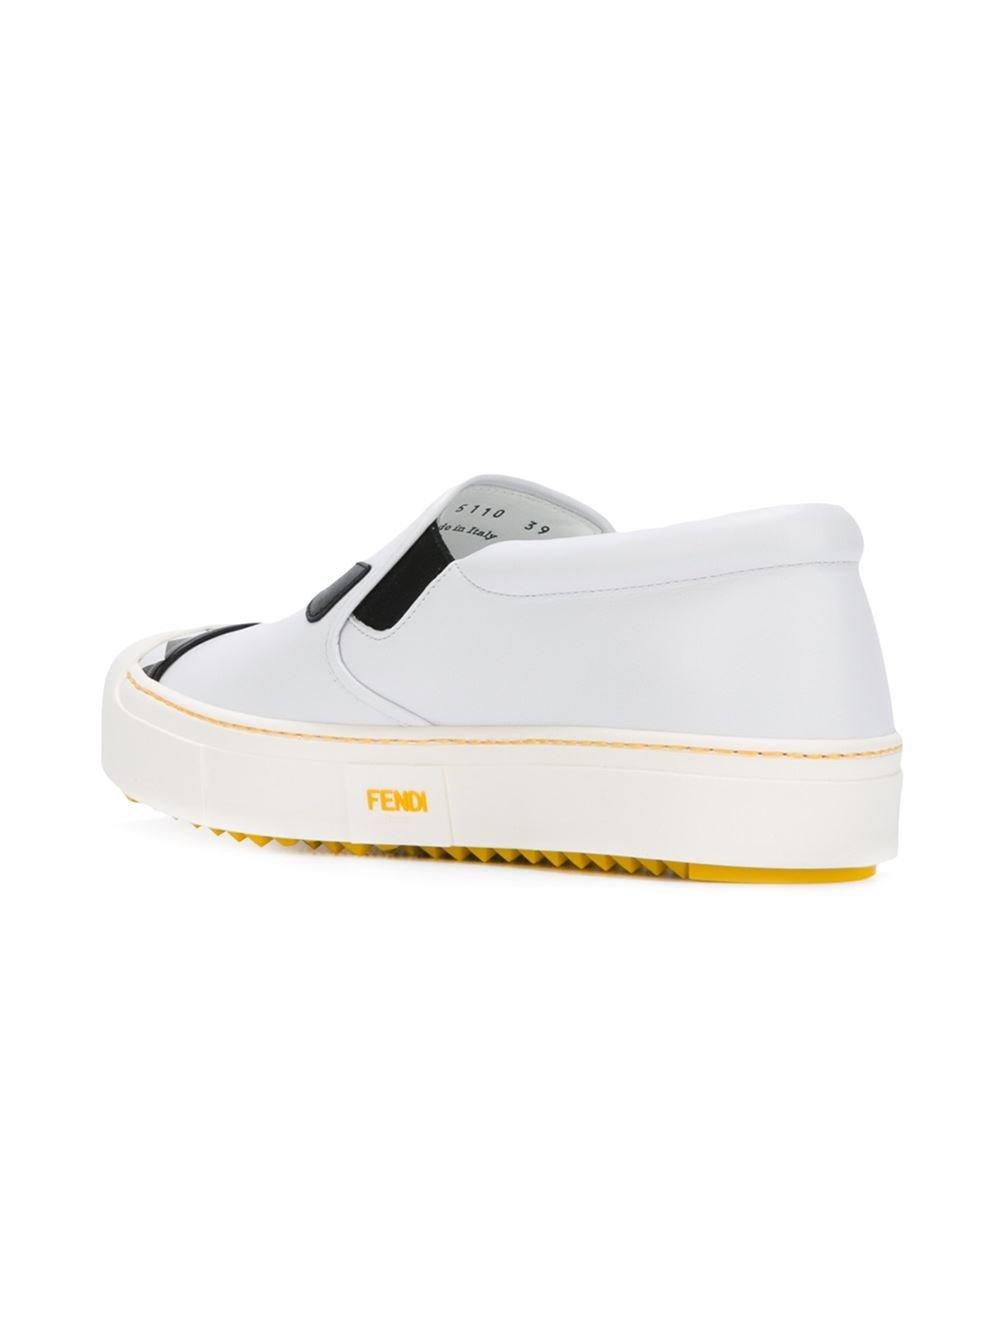 Bag Bugs colour-block sneakers - White Fendi Cheap Sale Amazon Buy Cheap Choice Cheap Prices Cheap Sale Cost VmXFEQ1a3C